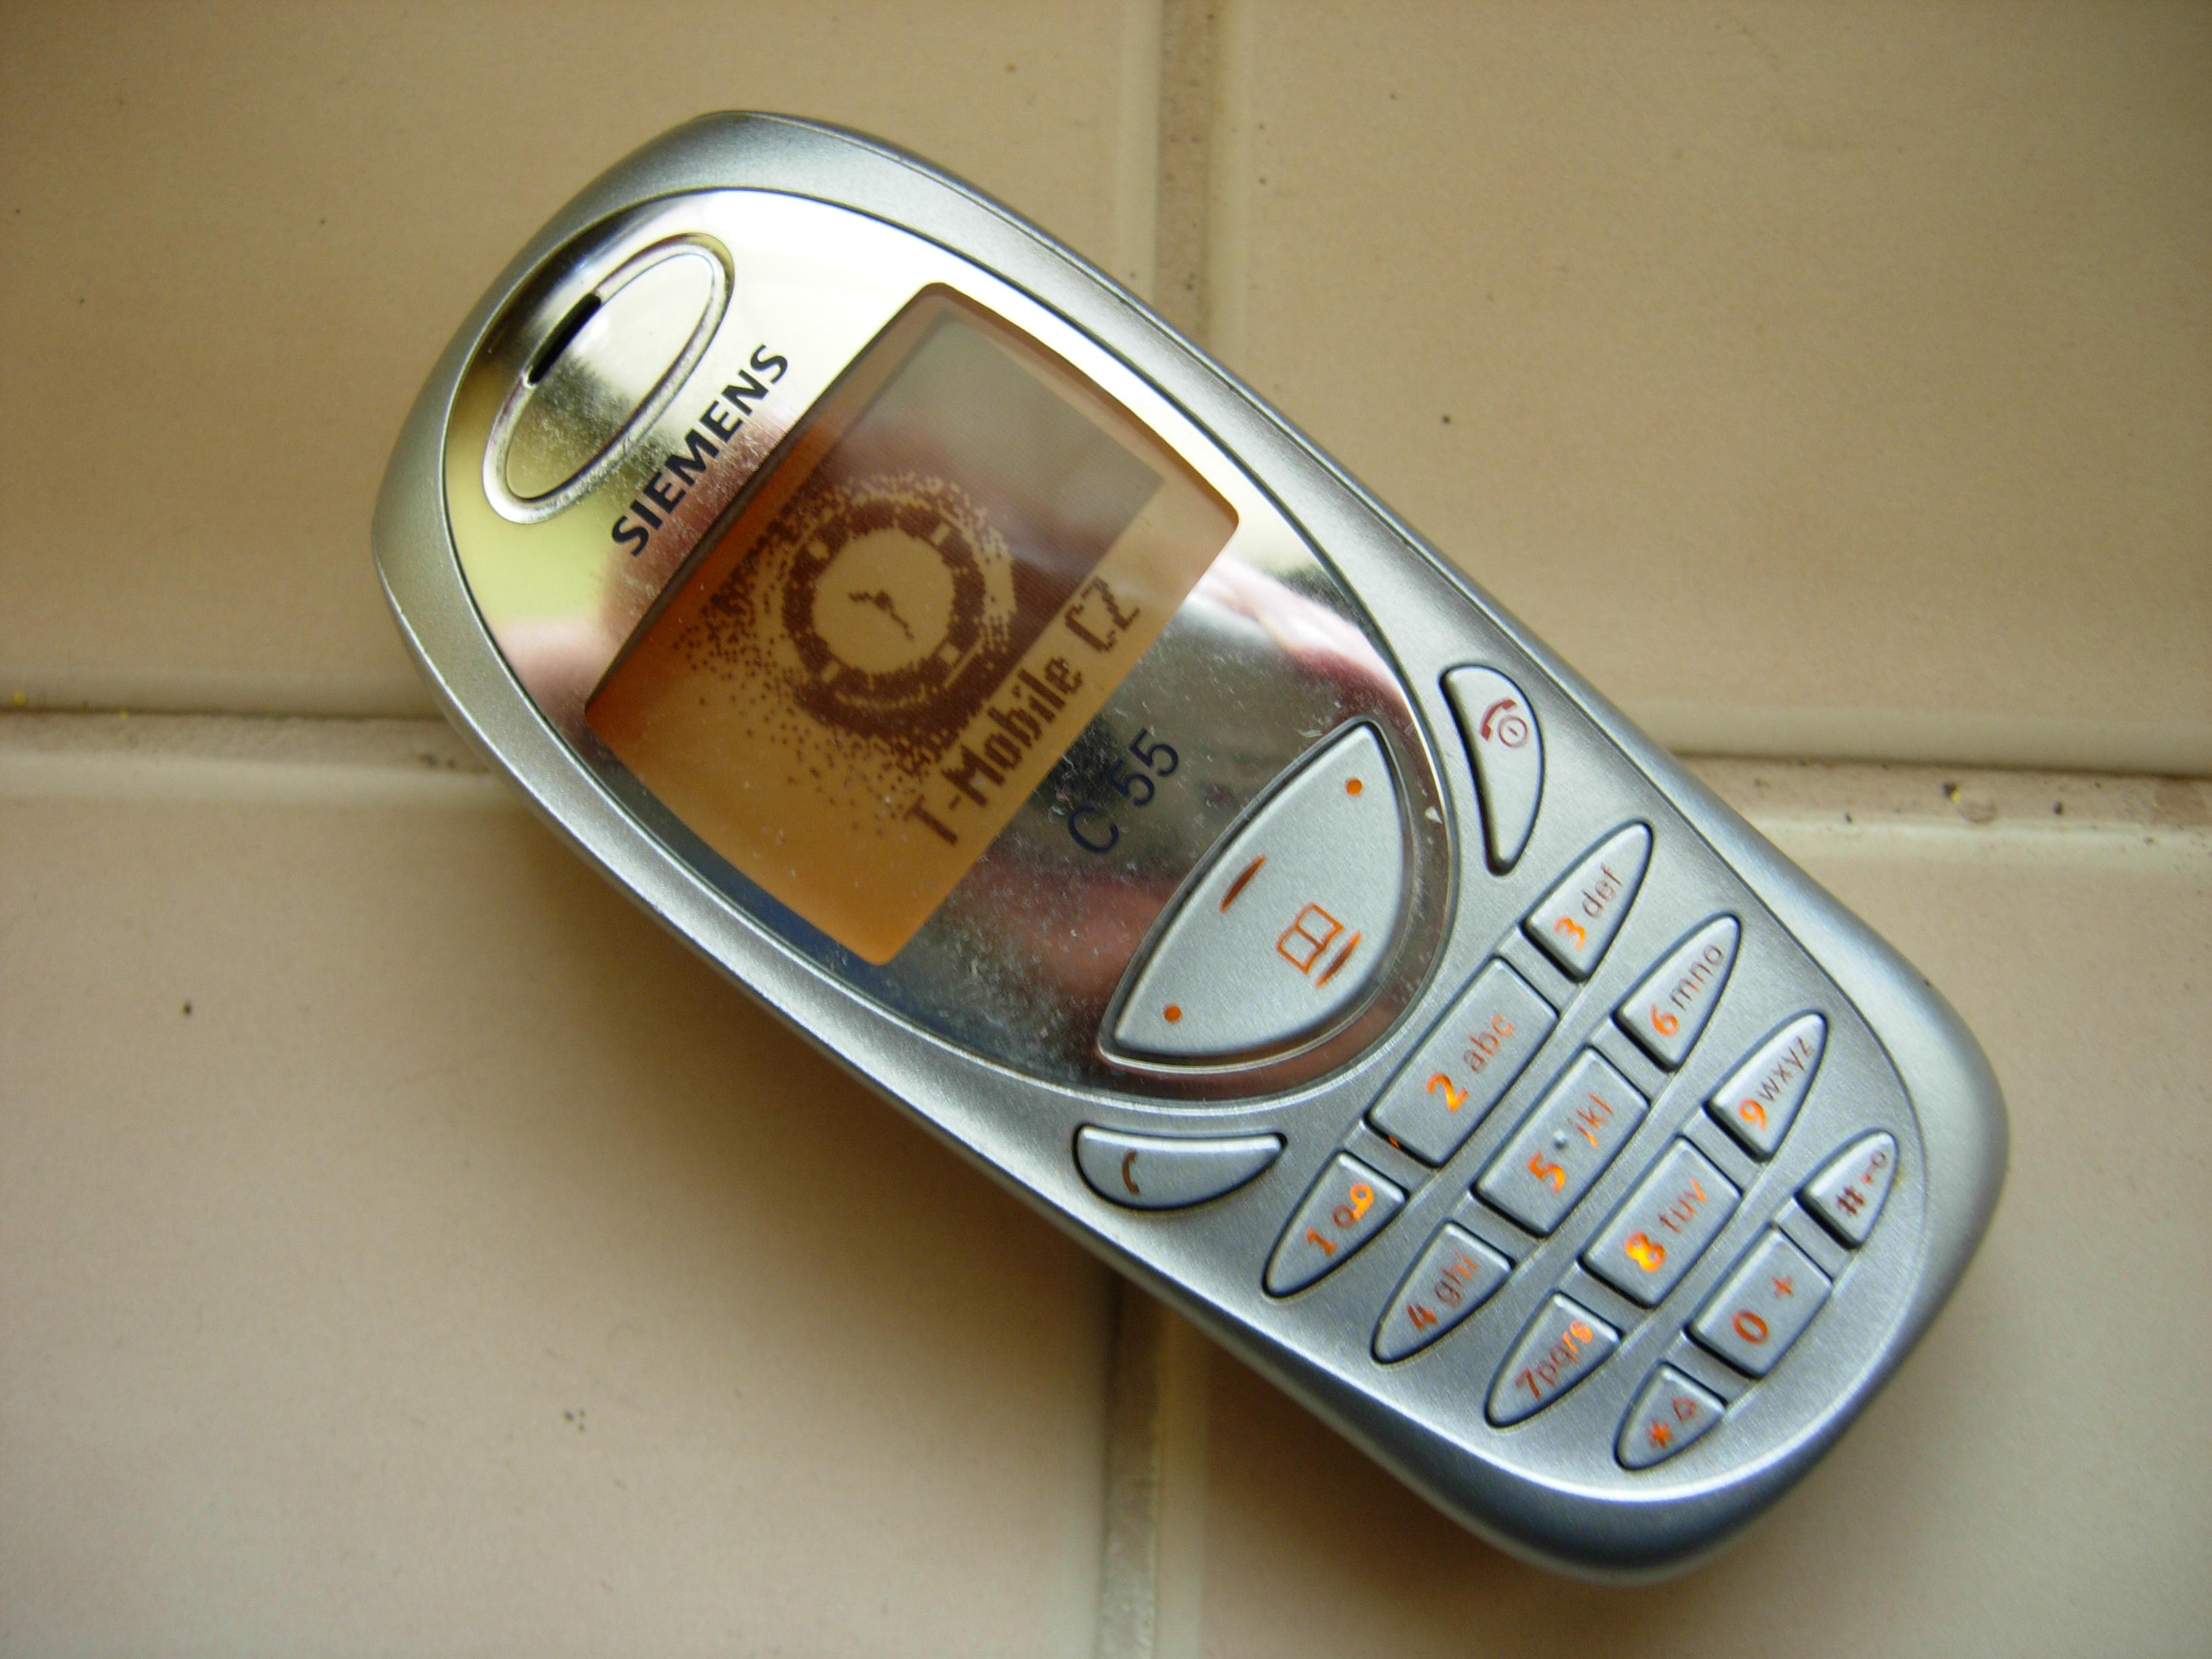 Resultado de imagen para celulares Siemens c55